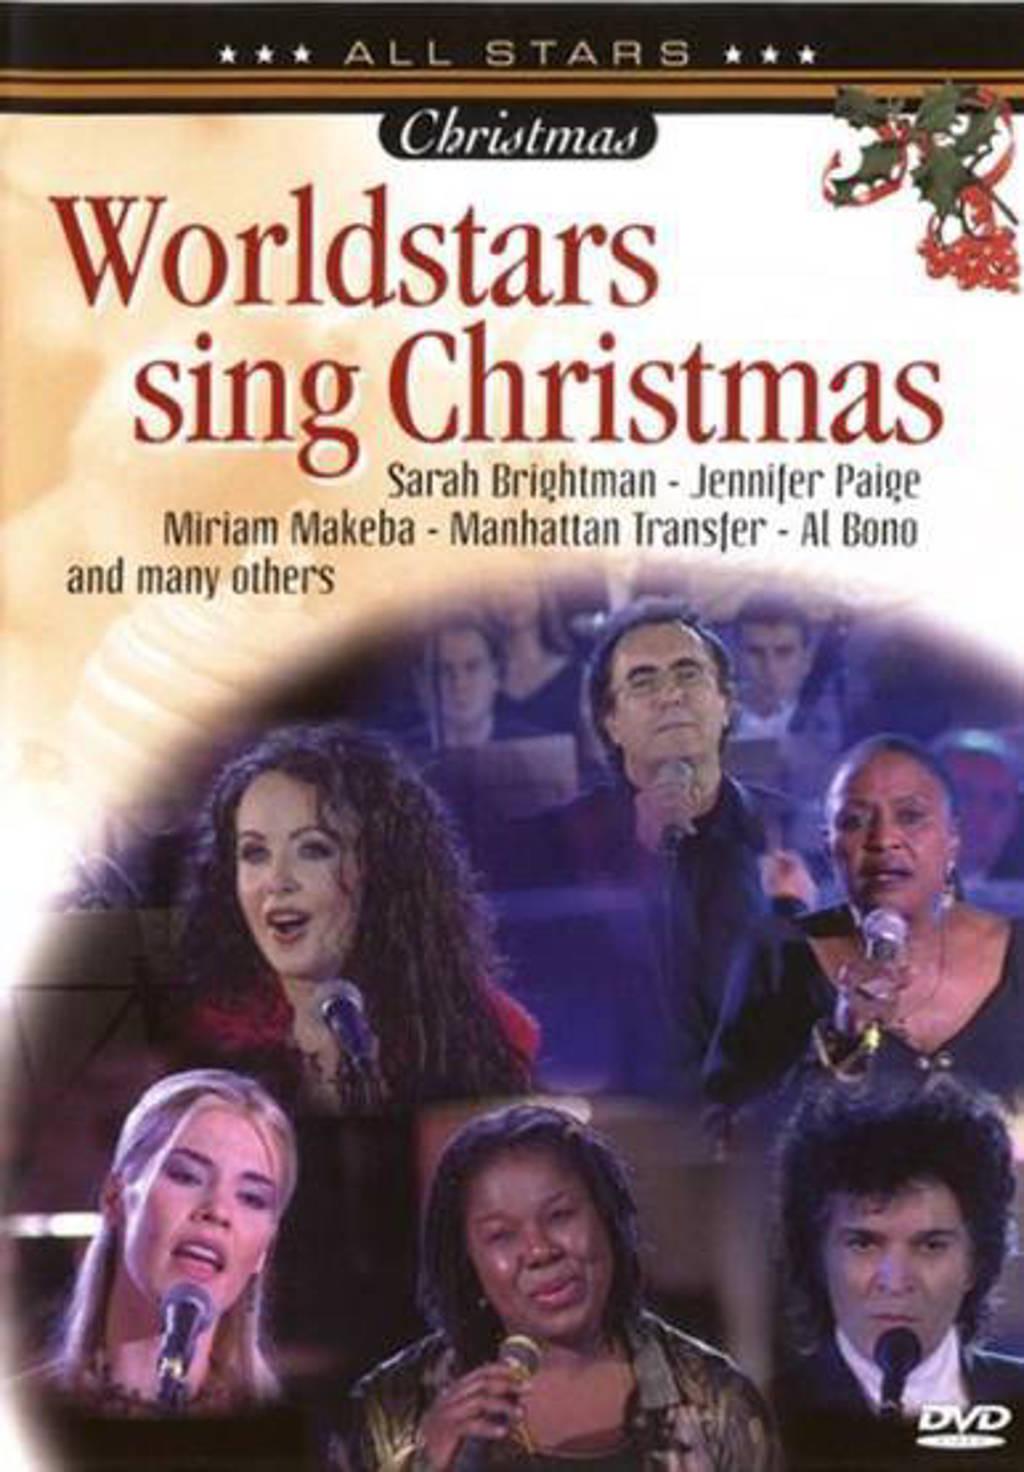 Worldstars sing christmas (DVD)